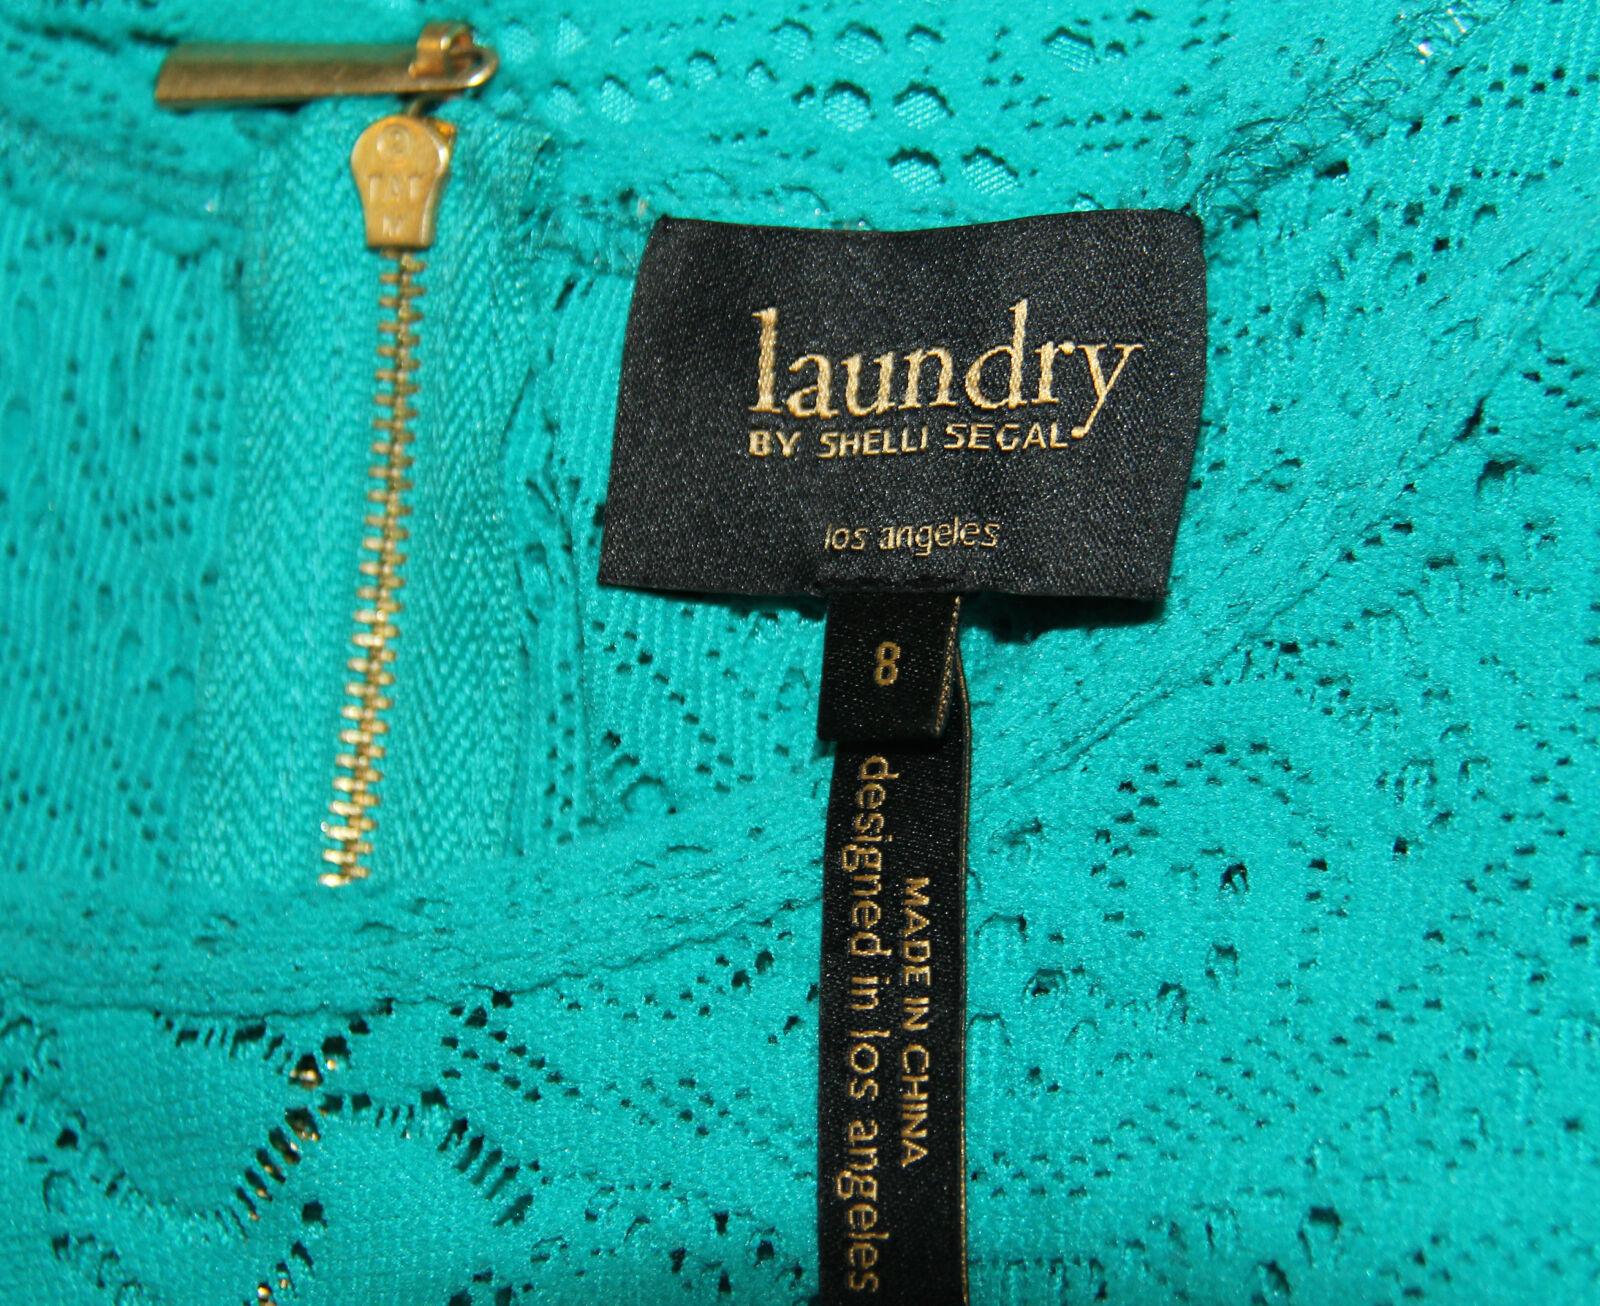 NEW NEW NEW Laundry by Shelli Segal Size 8 Asymmetrical Lace Ruffle Sheath Dress 6ad247